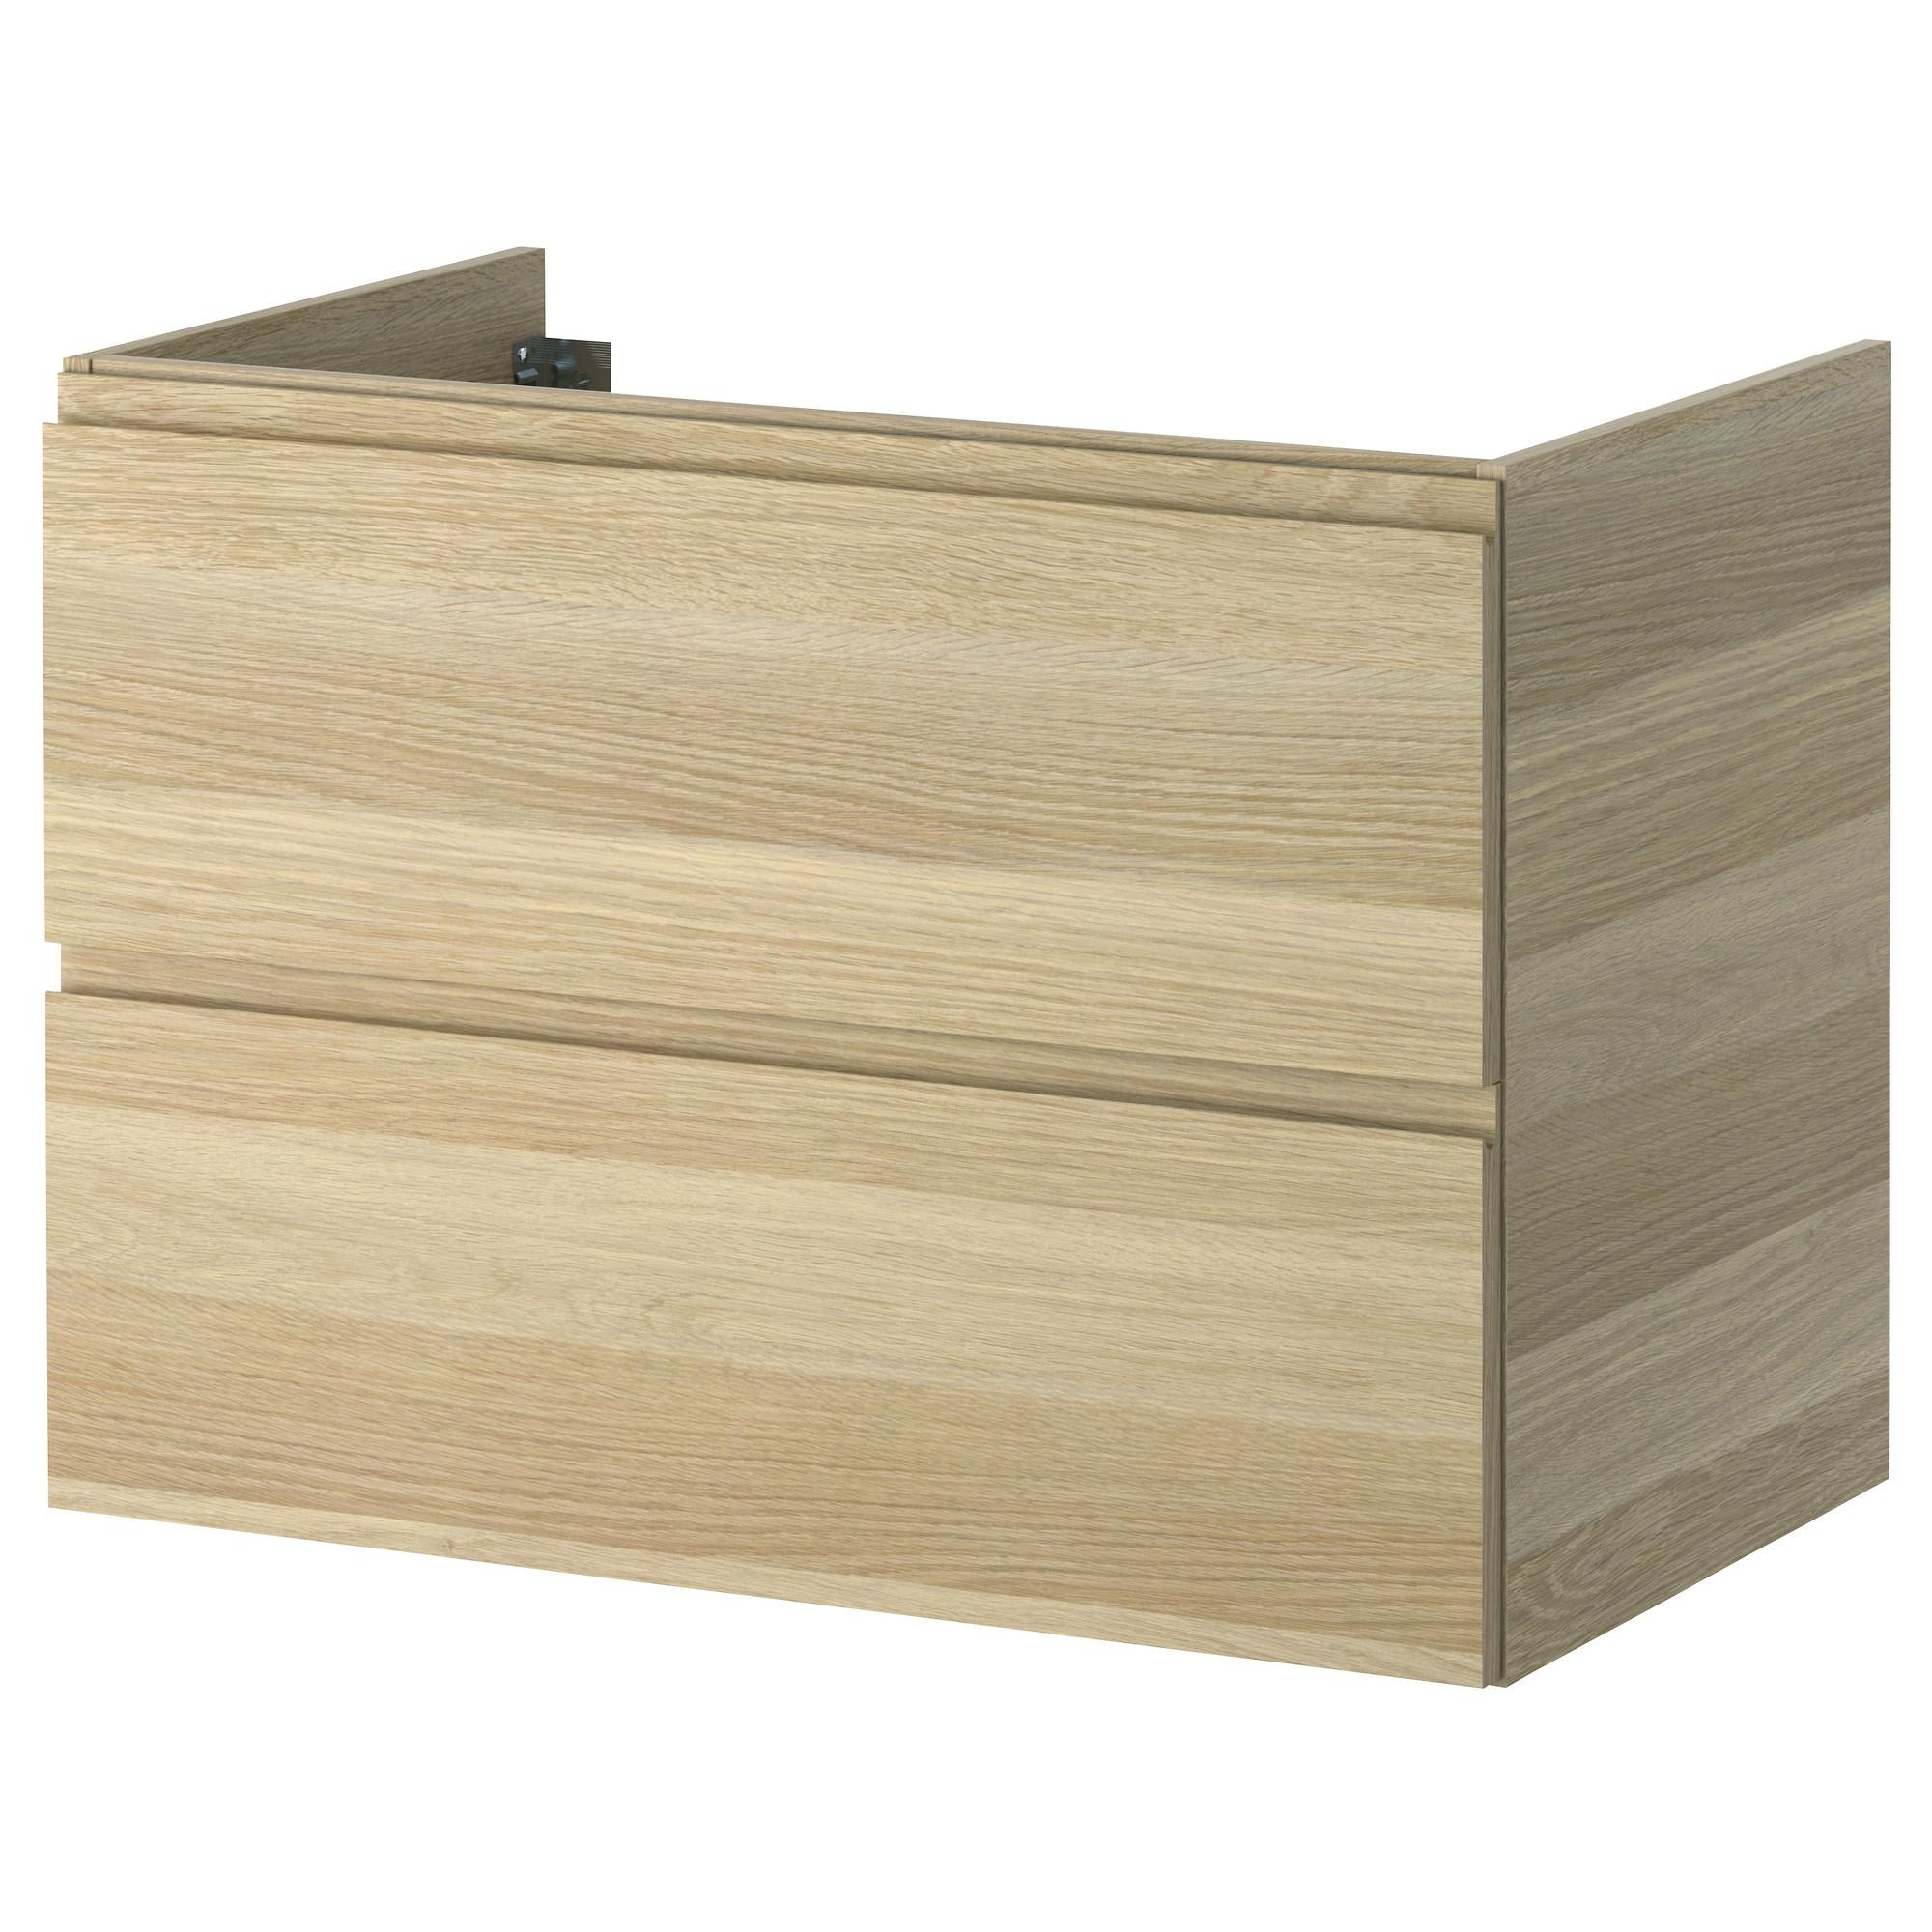 godmorgon armario lavabo 2 cajones 80 tinte roble. Black Bedroom Furniture Sets. Home Design Ideas